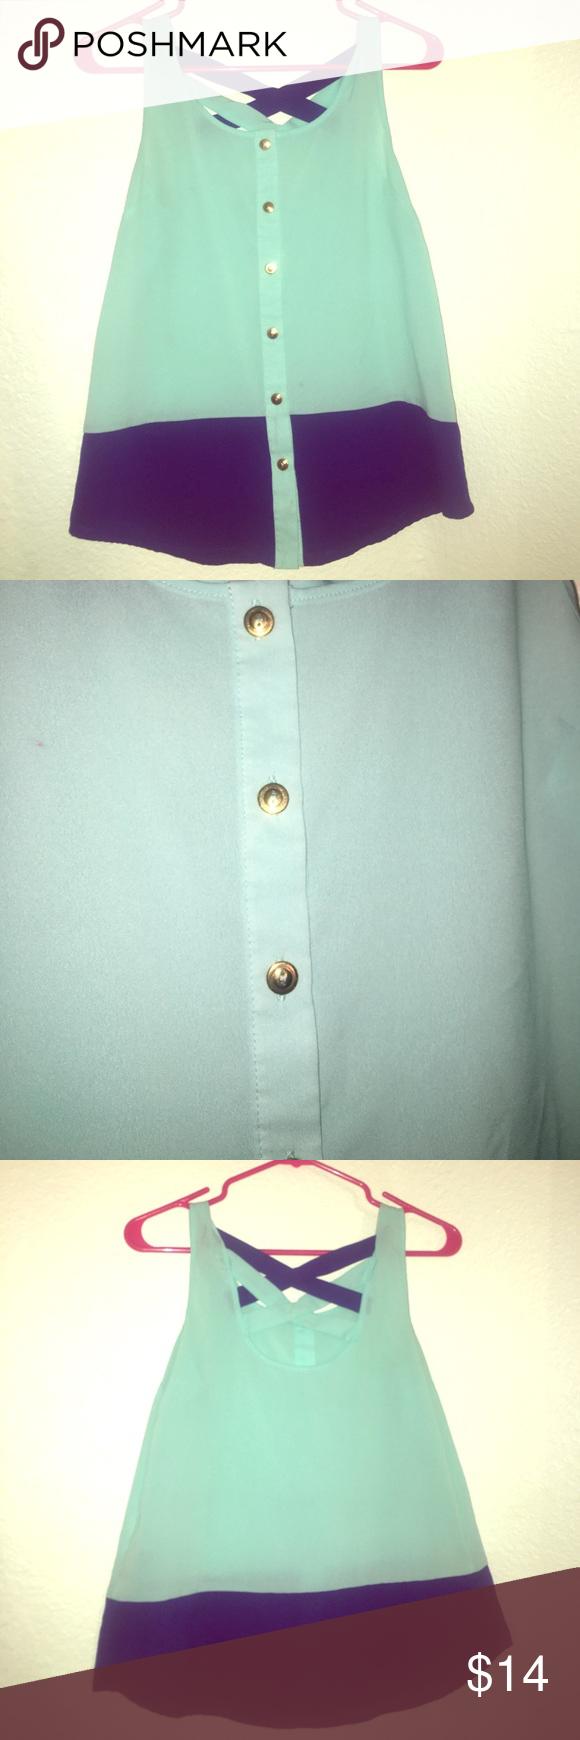 Seafoam green & royal blue blouse, SZ small | Royal blue color ...